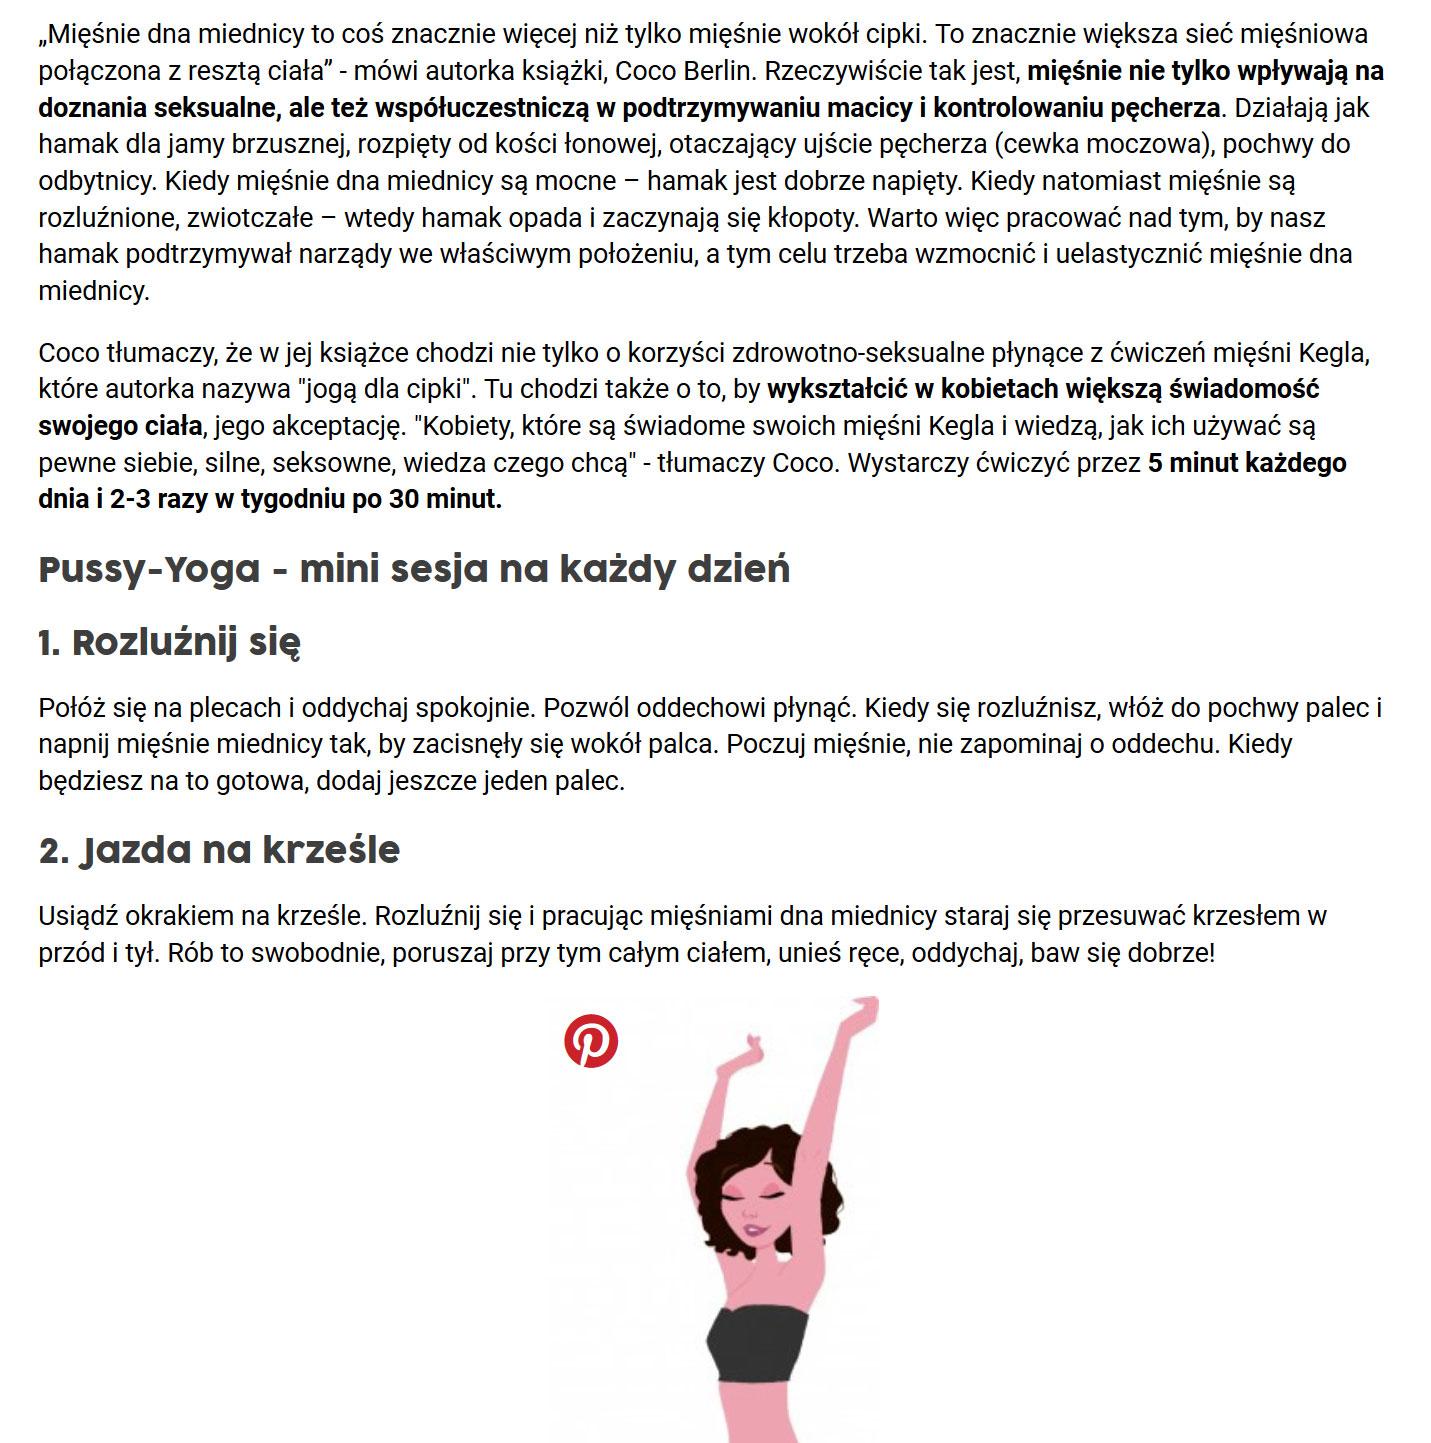 ofeminin-coco-berlin-pussy-yoga-2.jpg